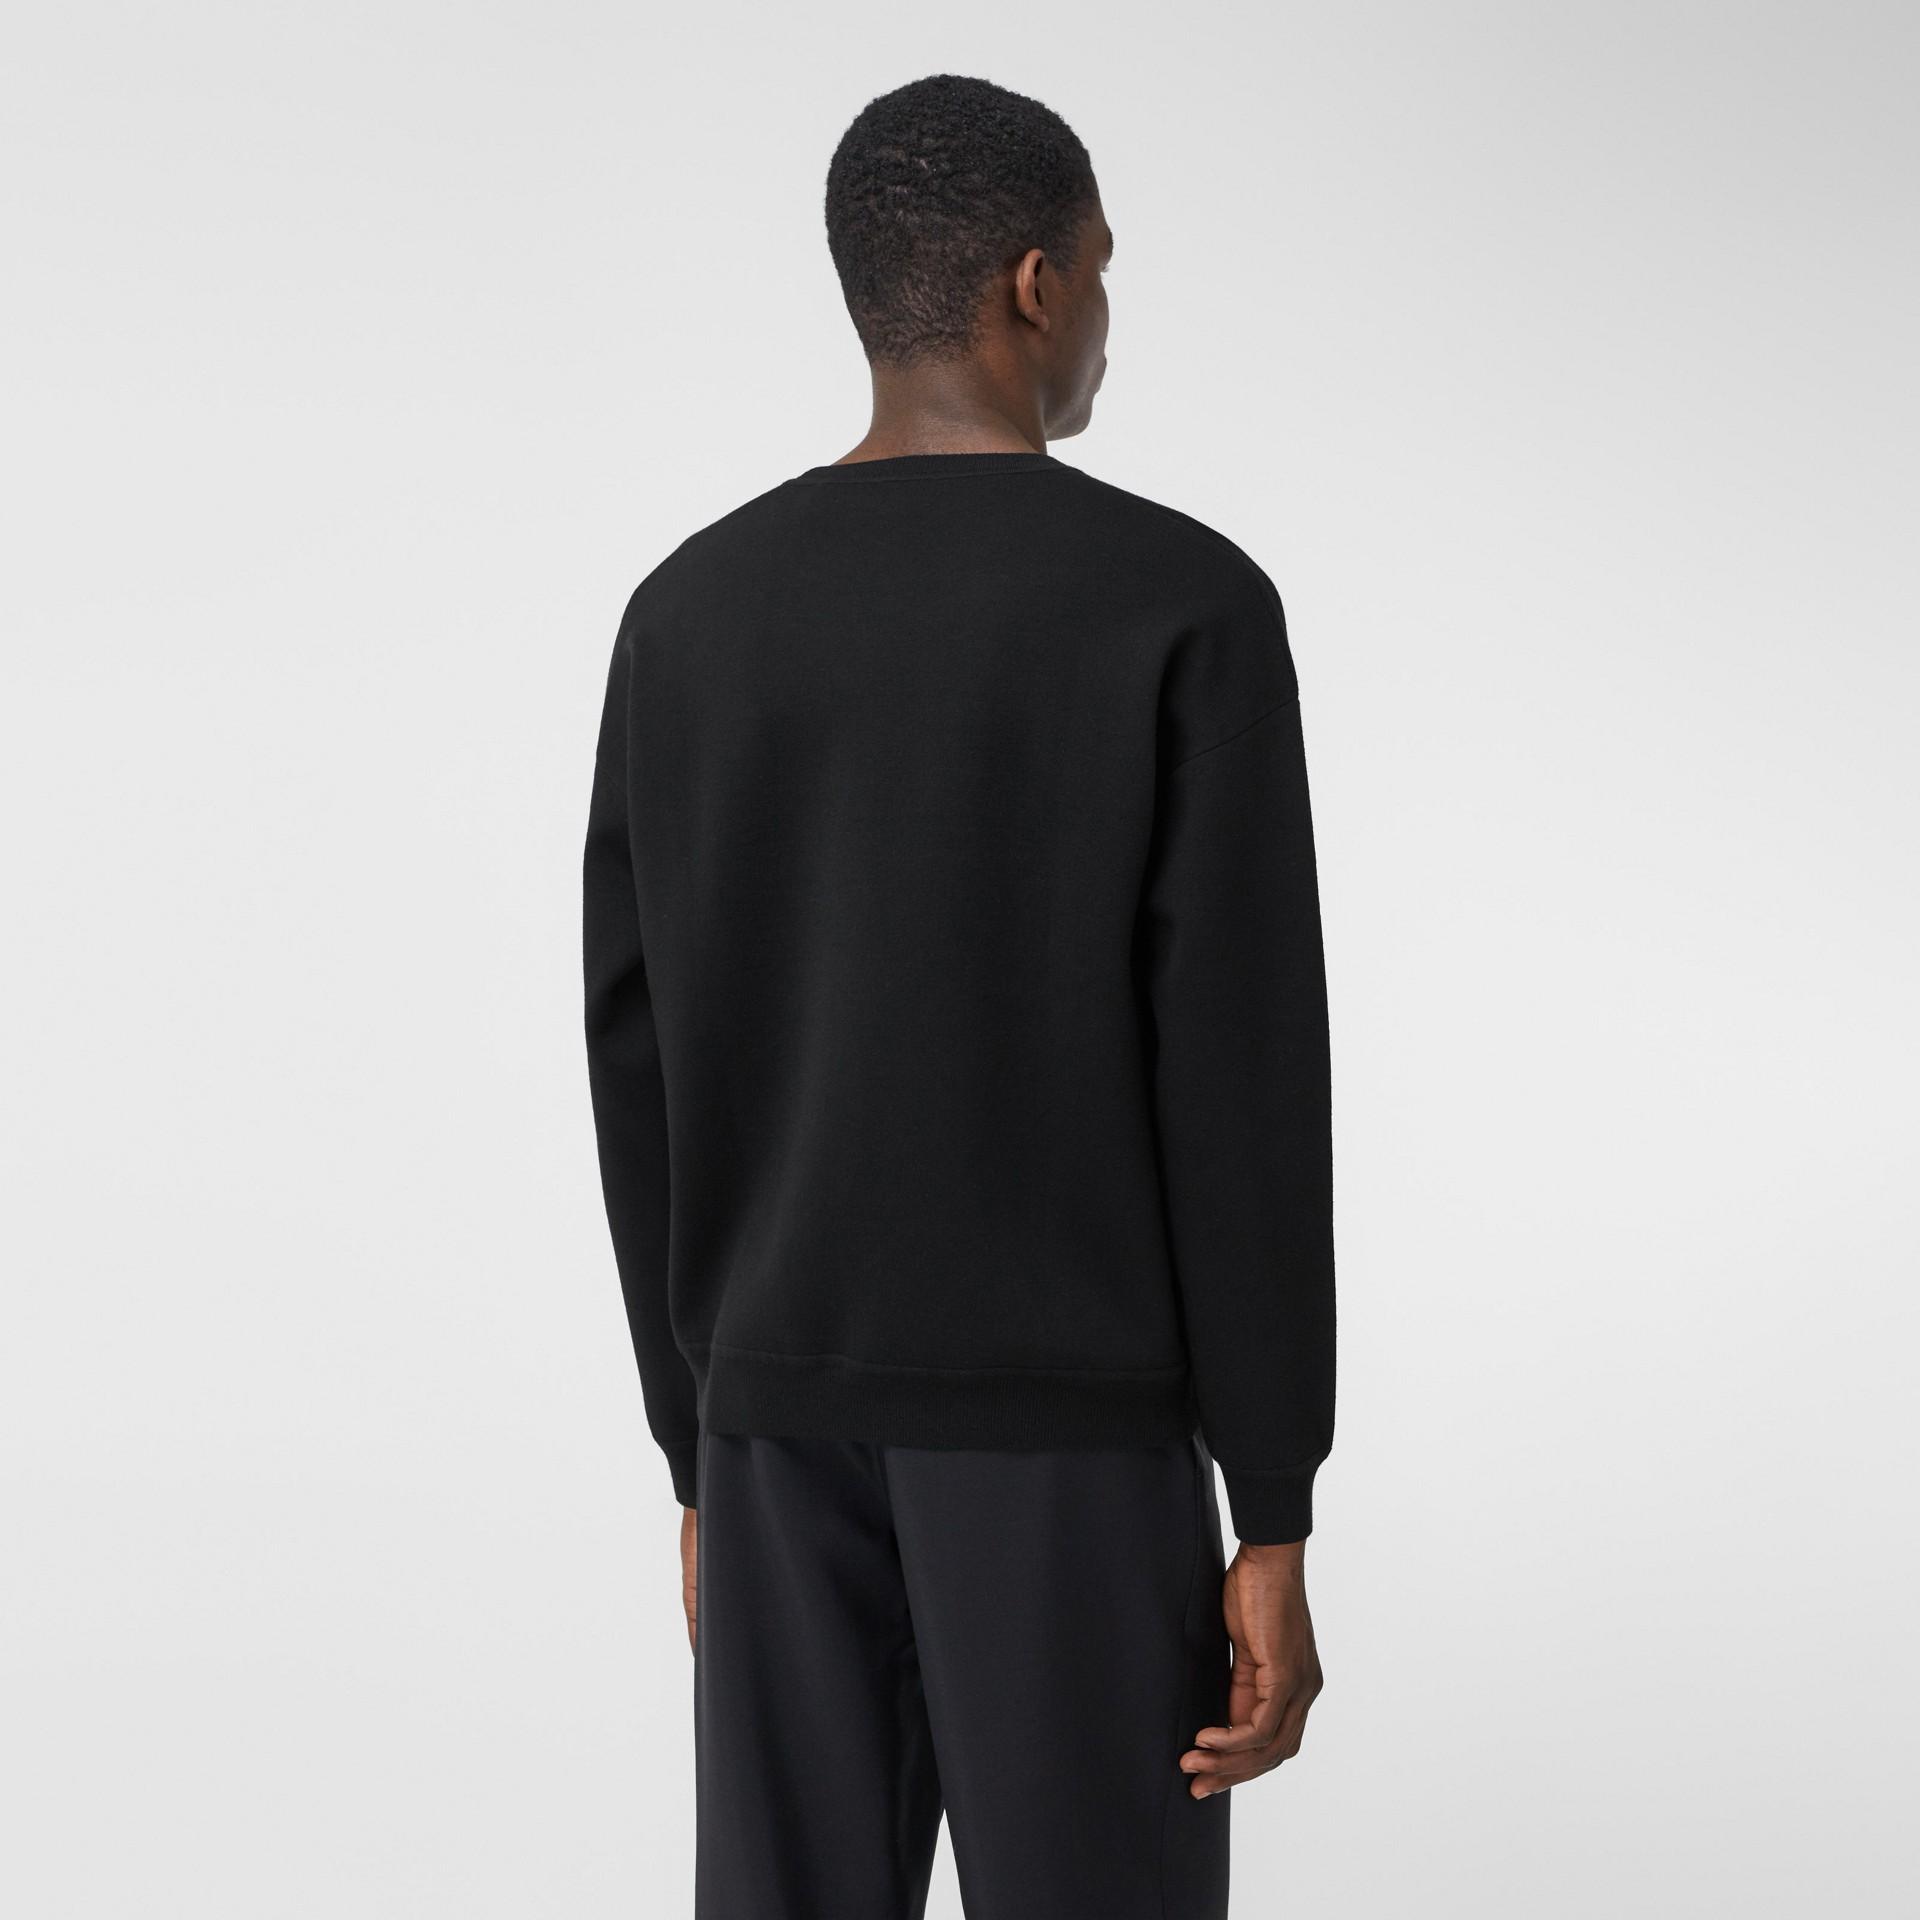 Slogan Intarsia Merino Wool Blend Sweater in Black - Men | Burberry Canada - gallery image 2